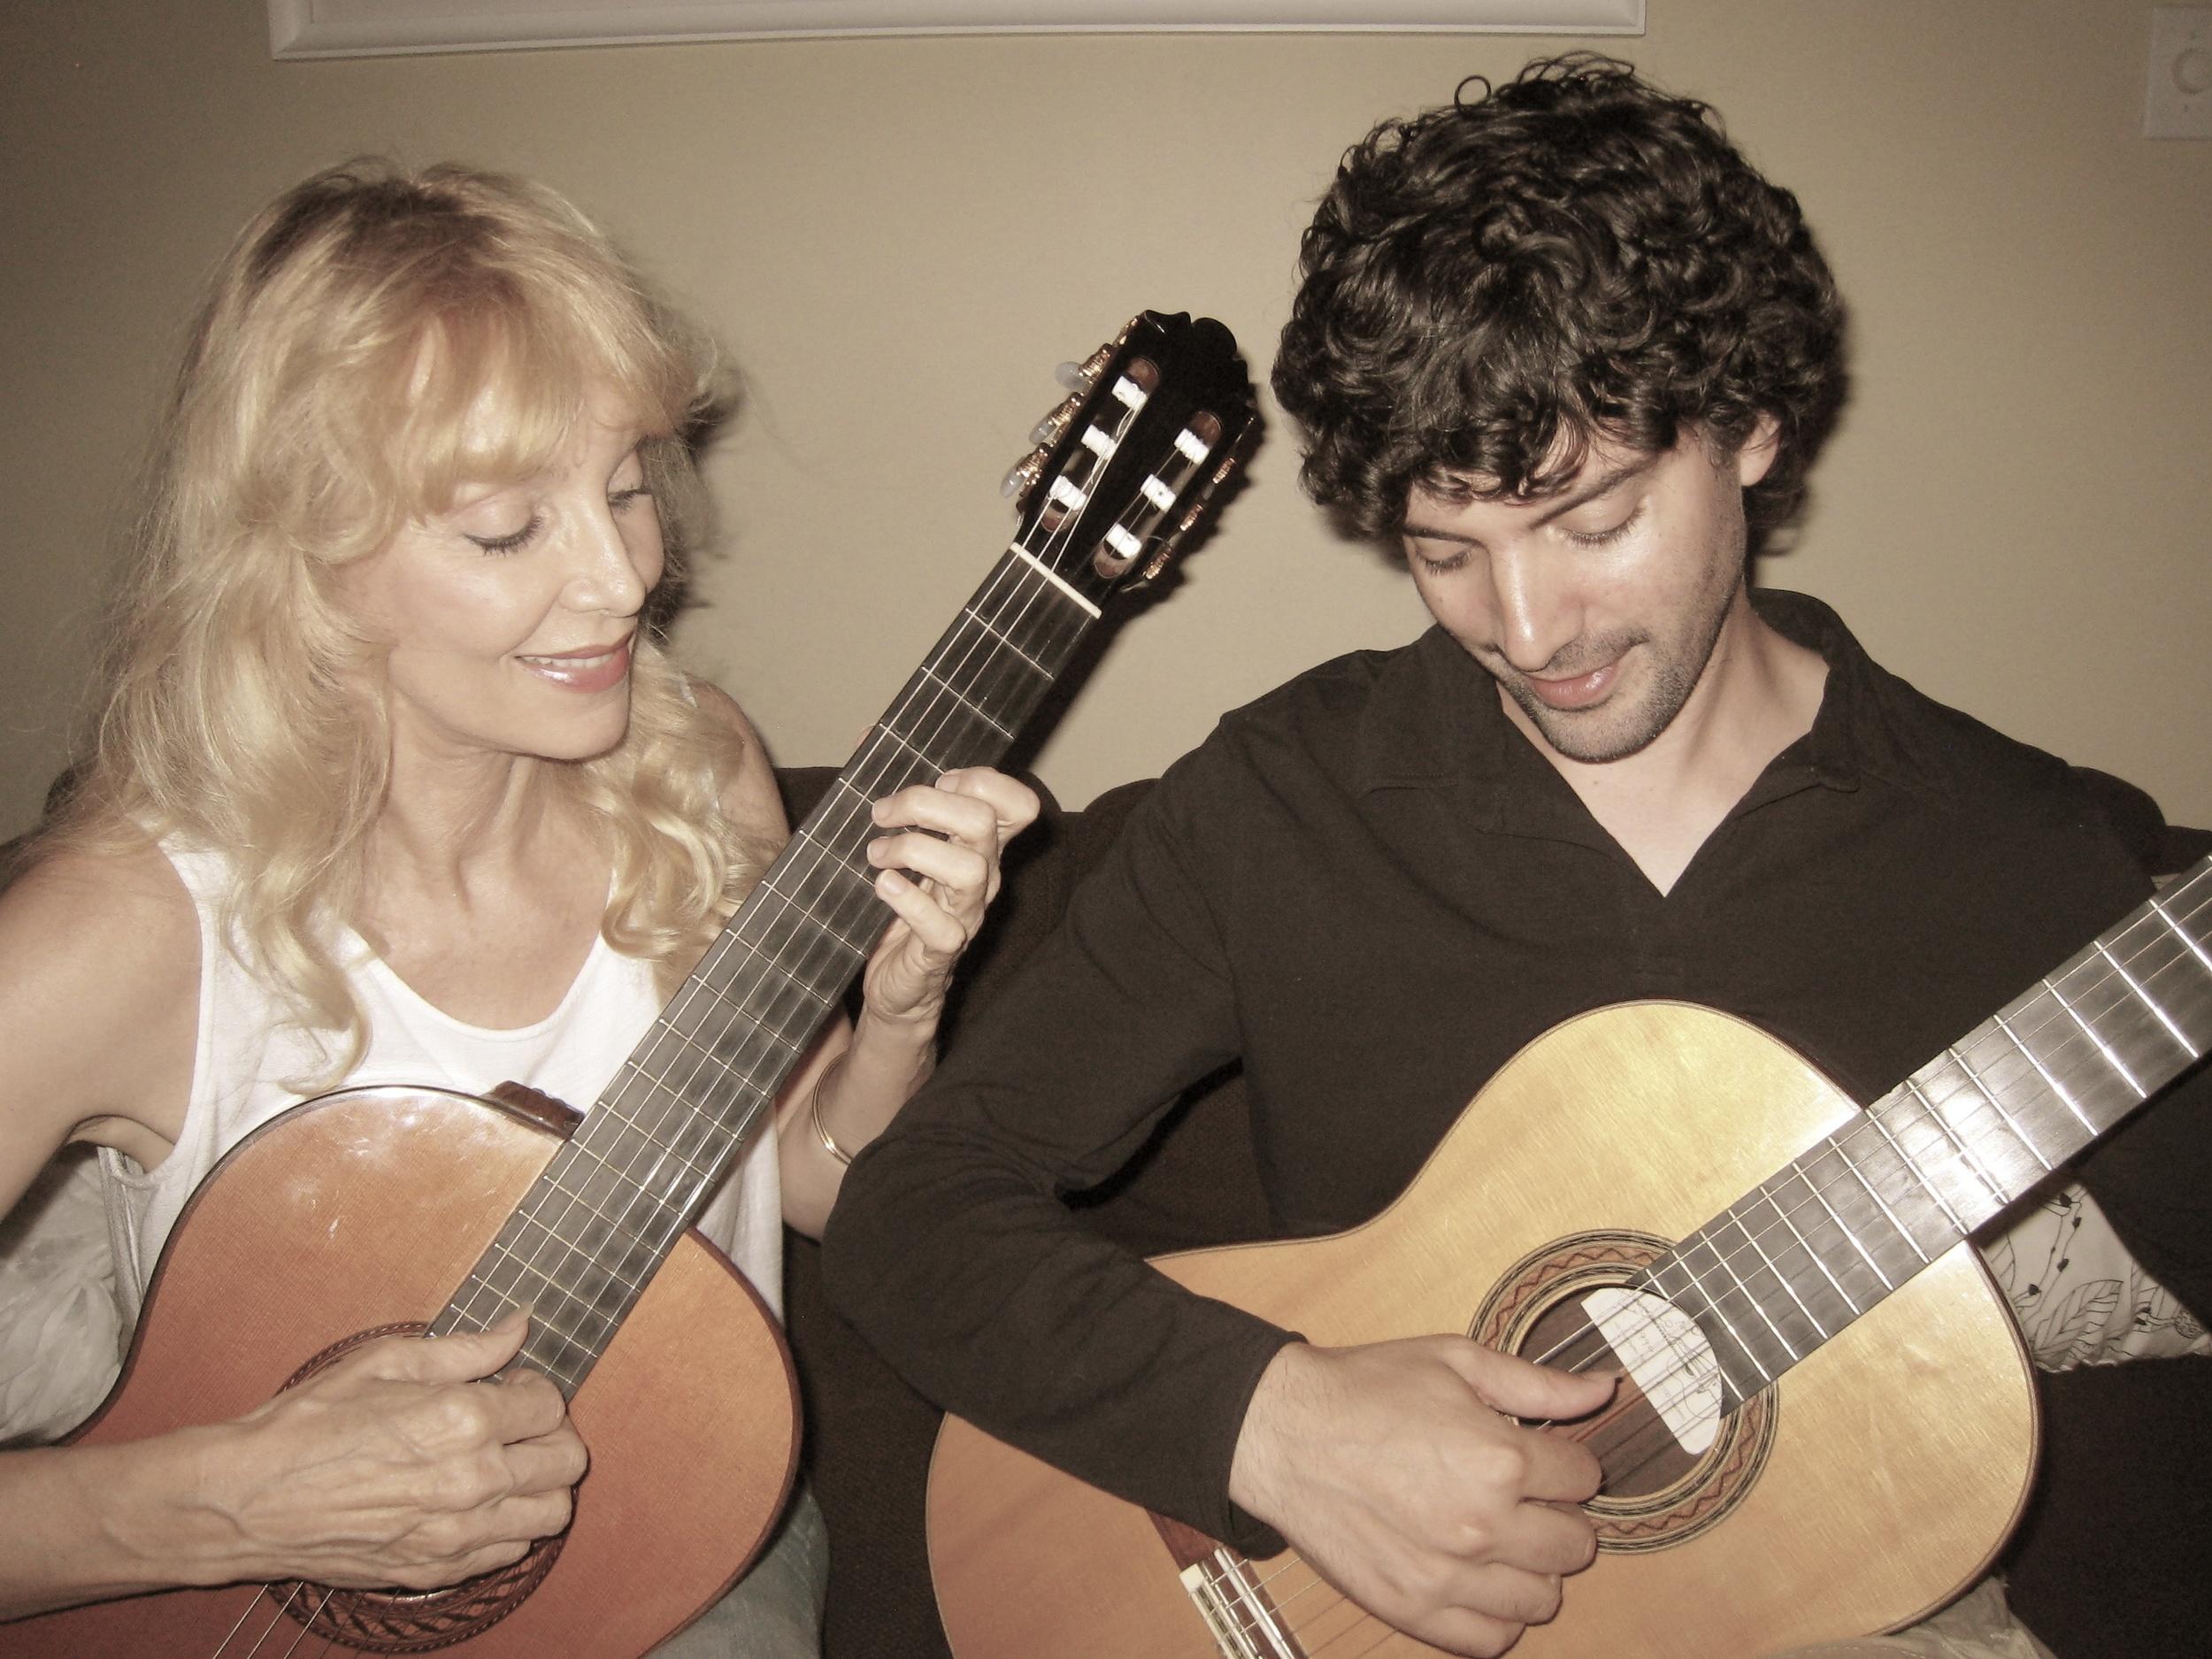 2011 with accompanist Micheal Savona